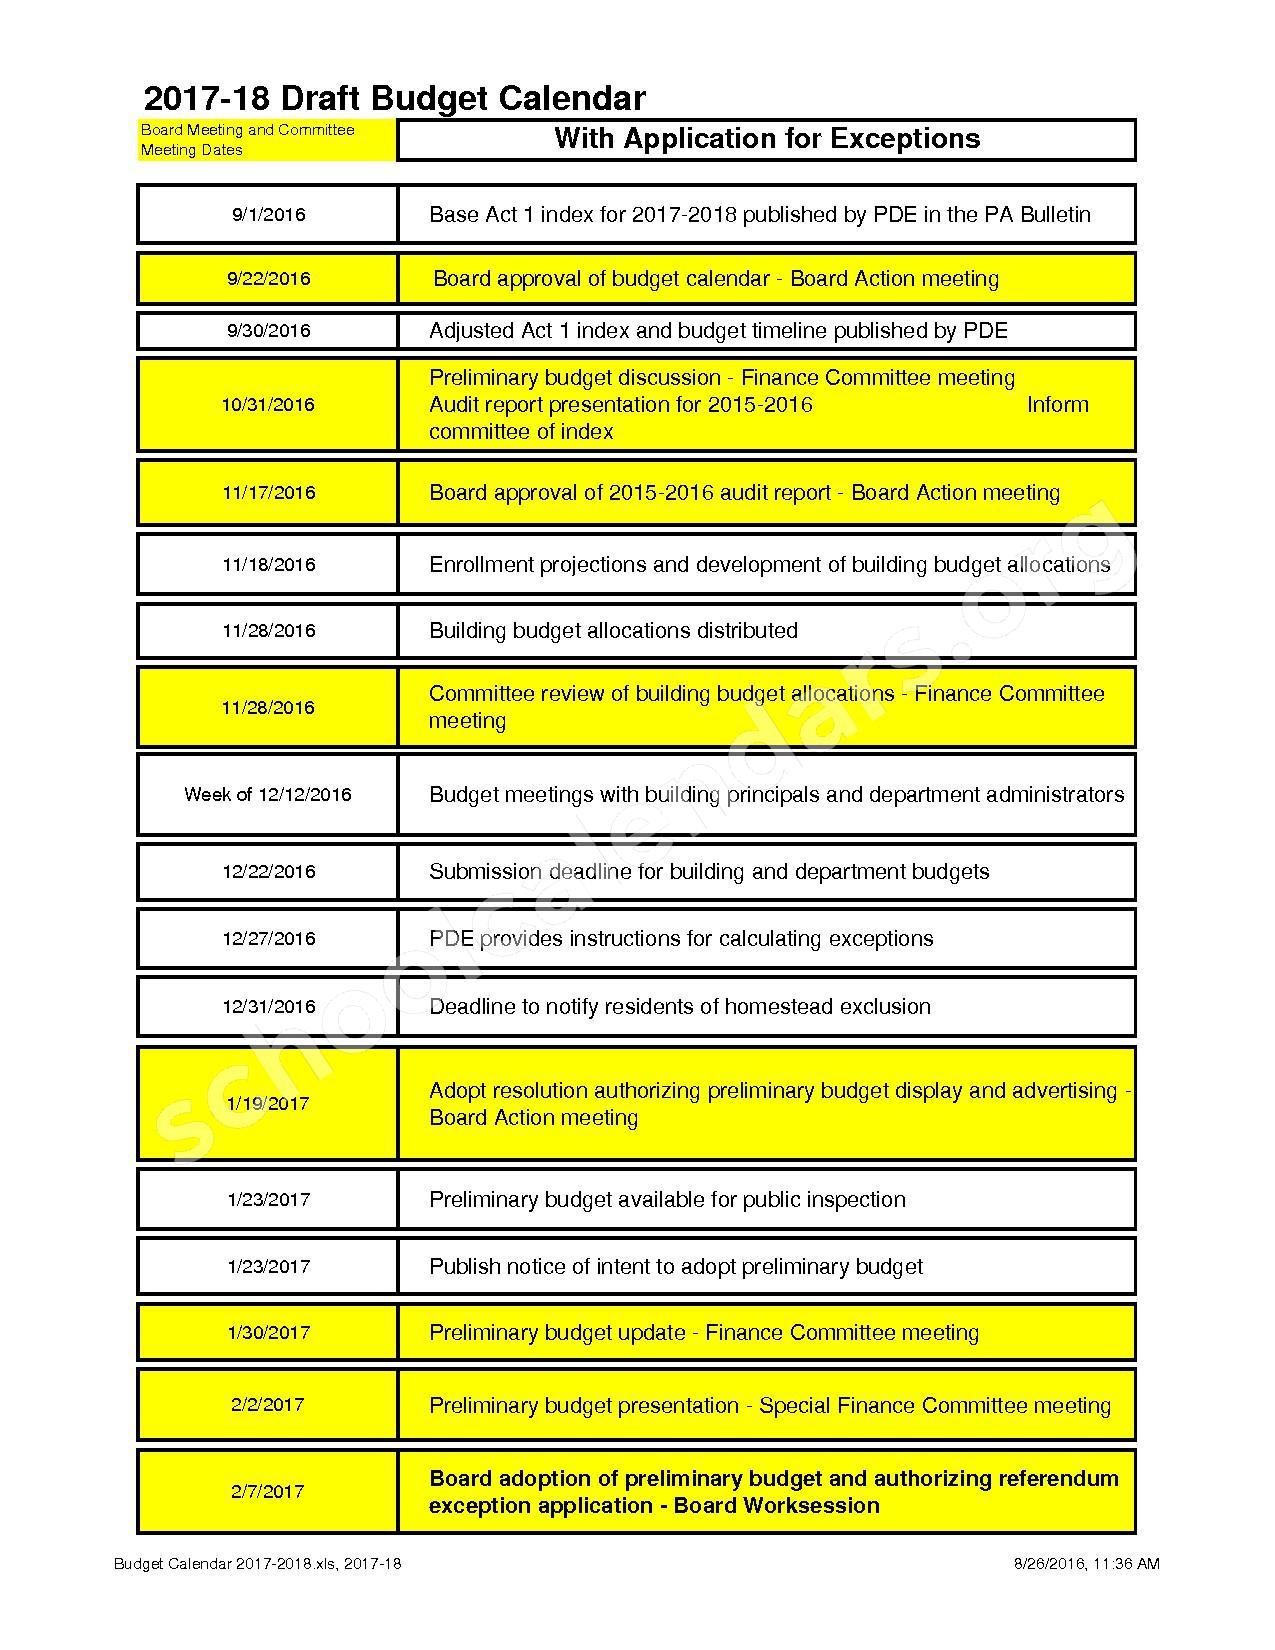 2017 - 2018 School Calendar – North Penn School District – page 1